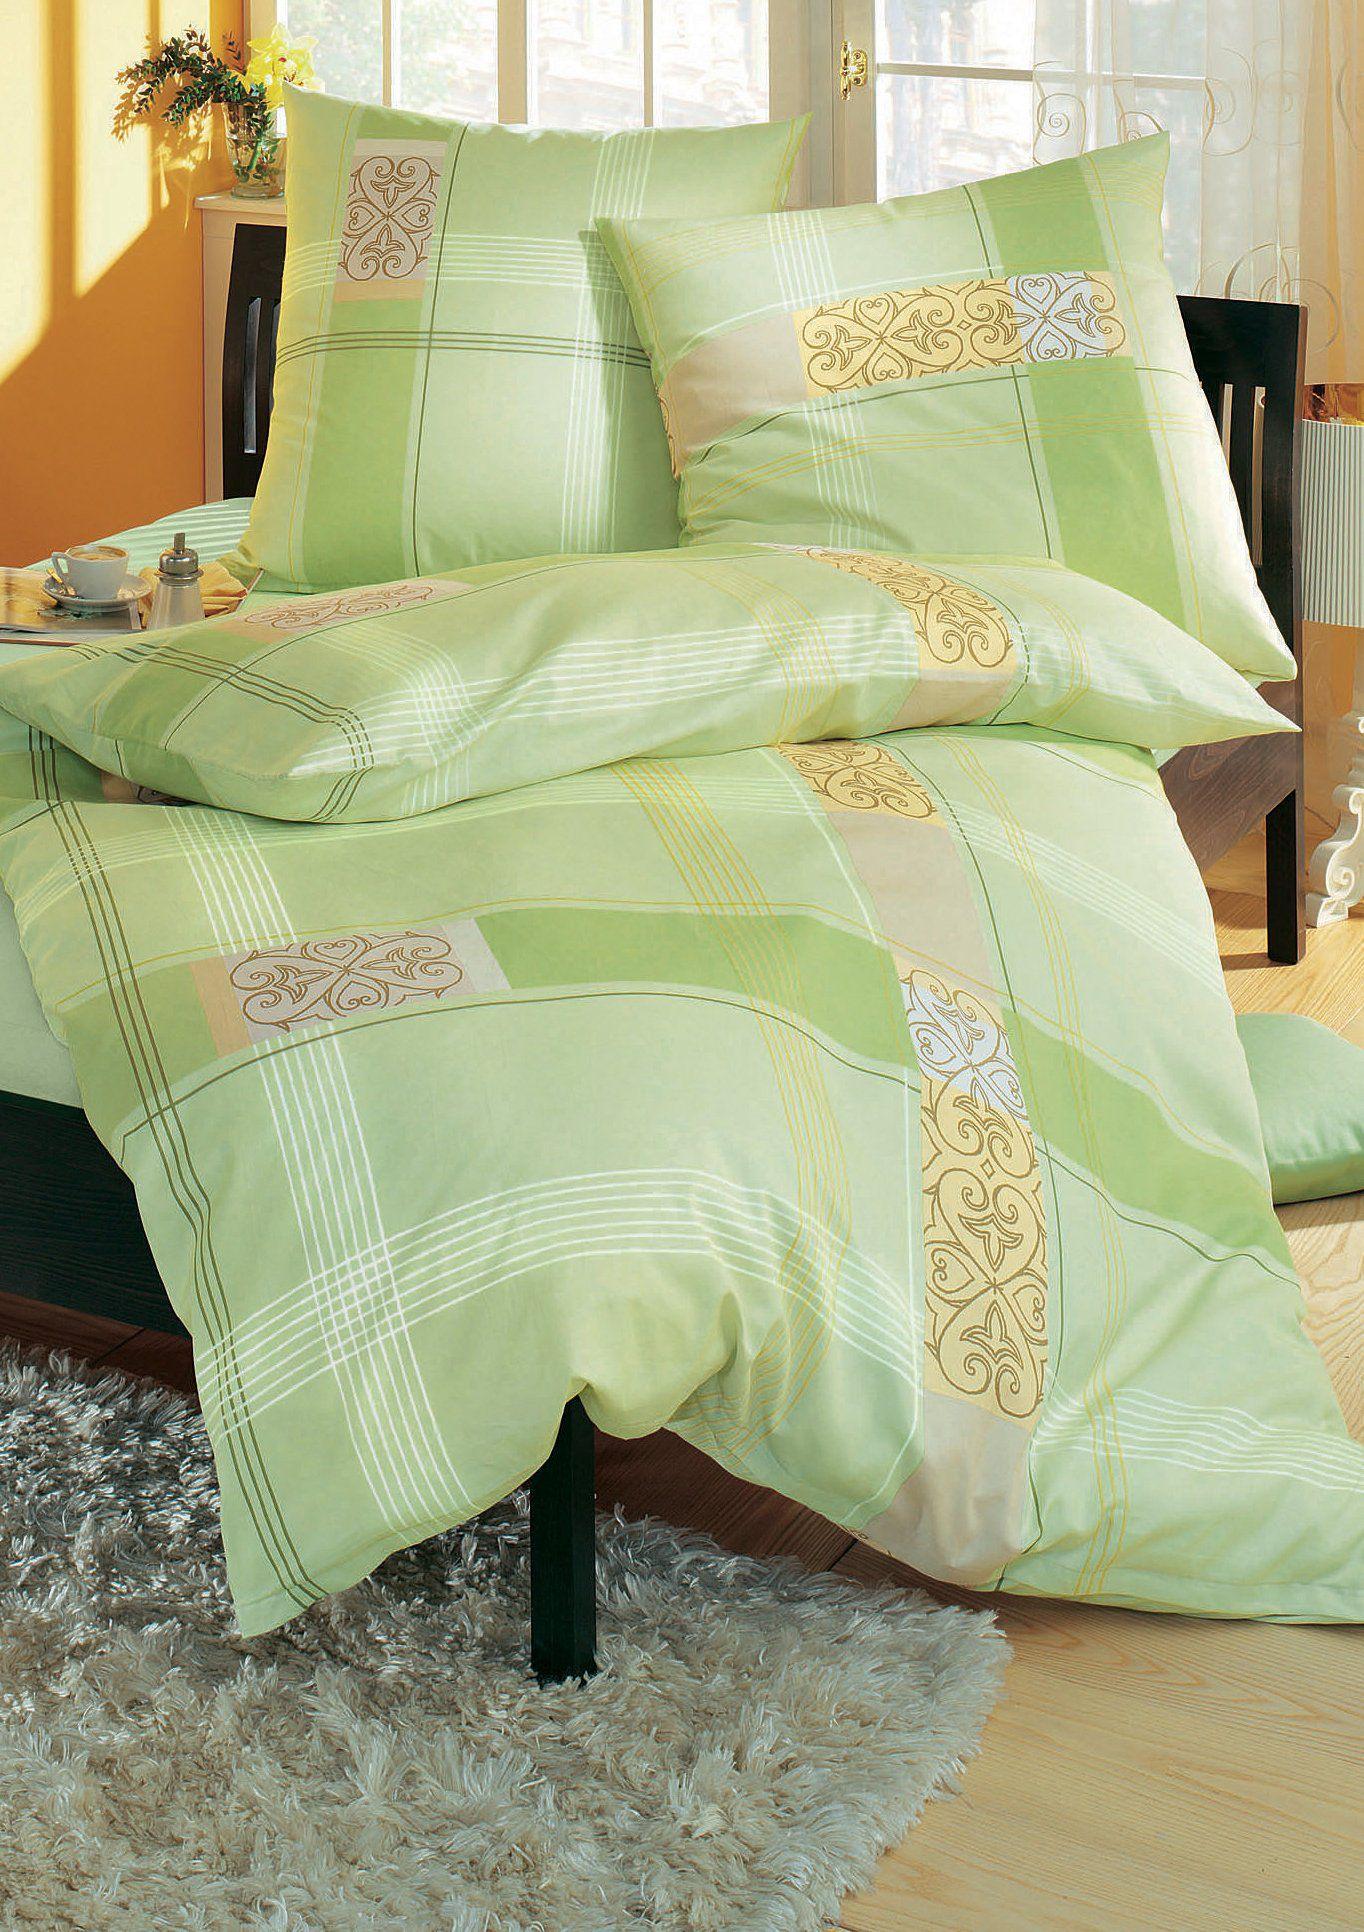 bettw sche dormisette 4tlg schwab versand 4. Black Bedroom Furniture Sets. Home Design Ideas